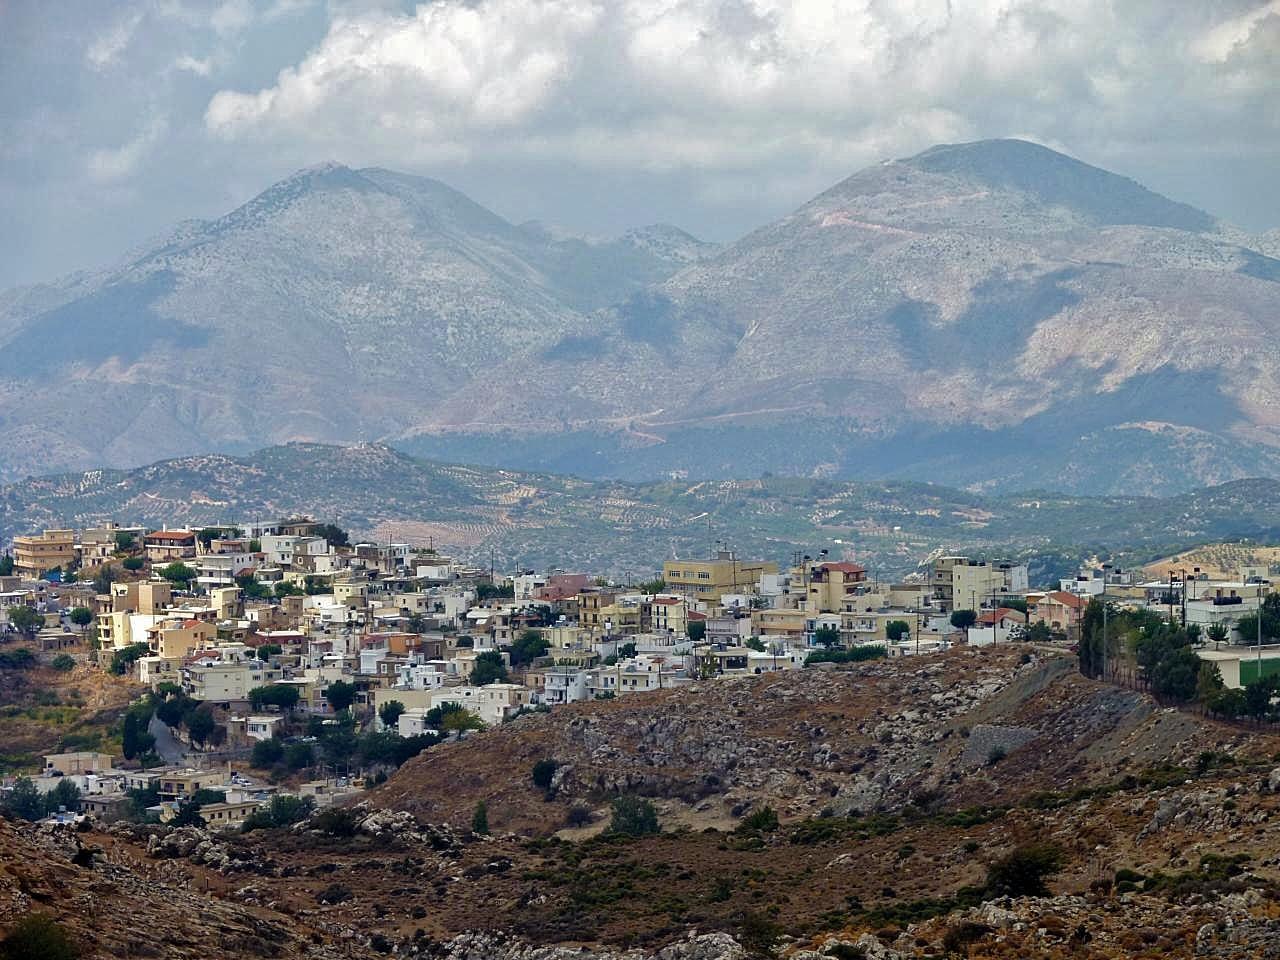 Anogia Village Rethimno Crete, anogia village travel guide, anogia village things to do, anogia gastronomy, anogia village music